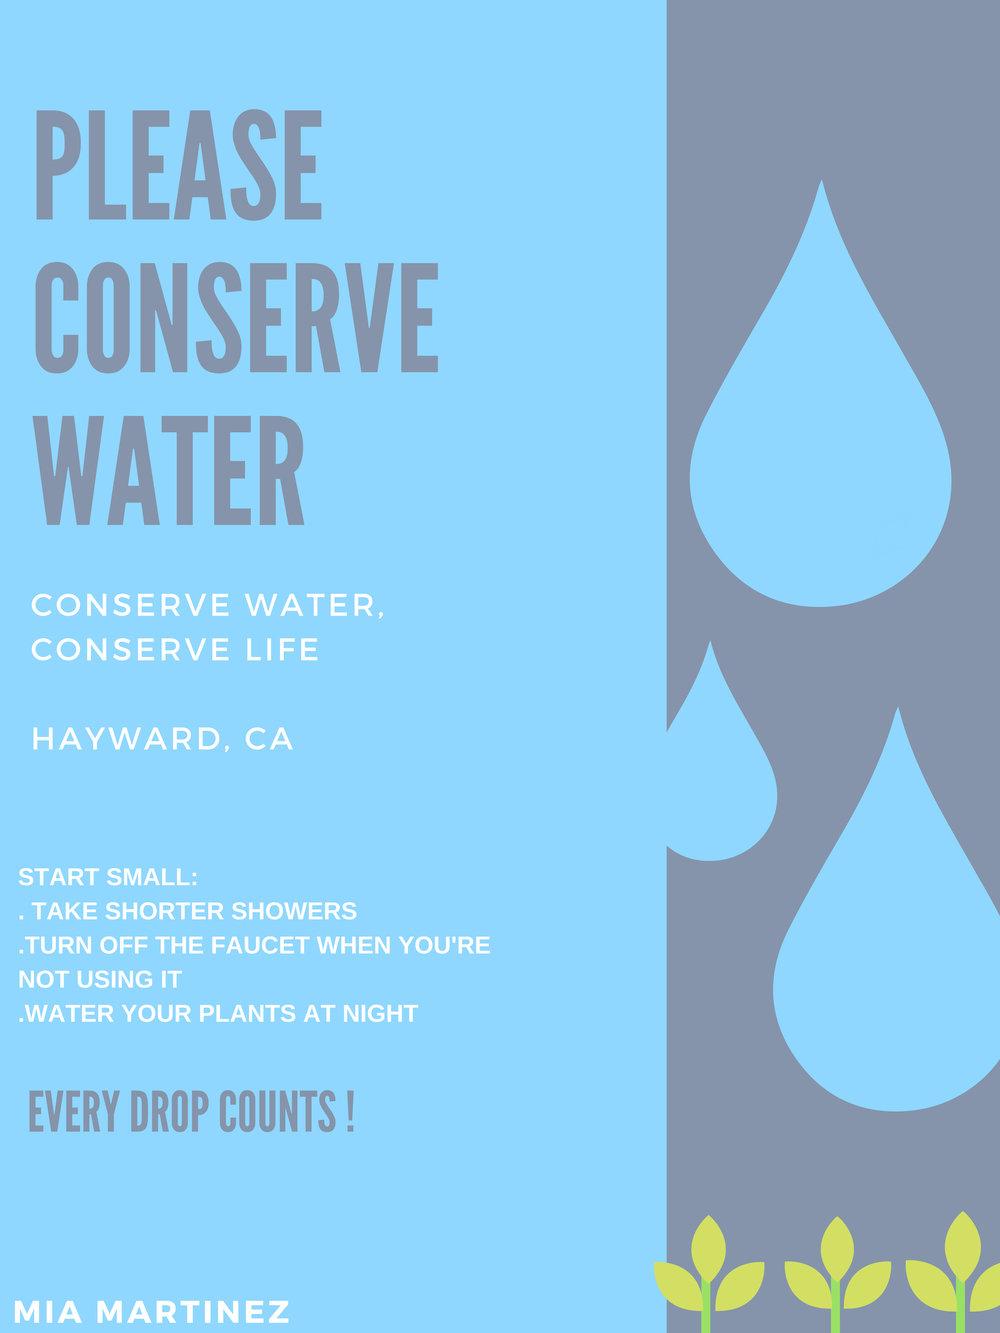 Please conserve water.jpg